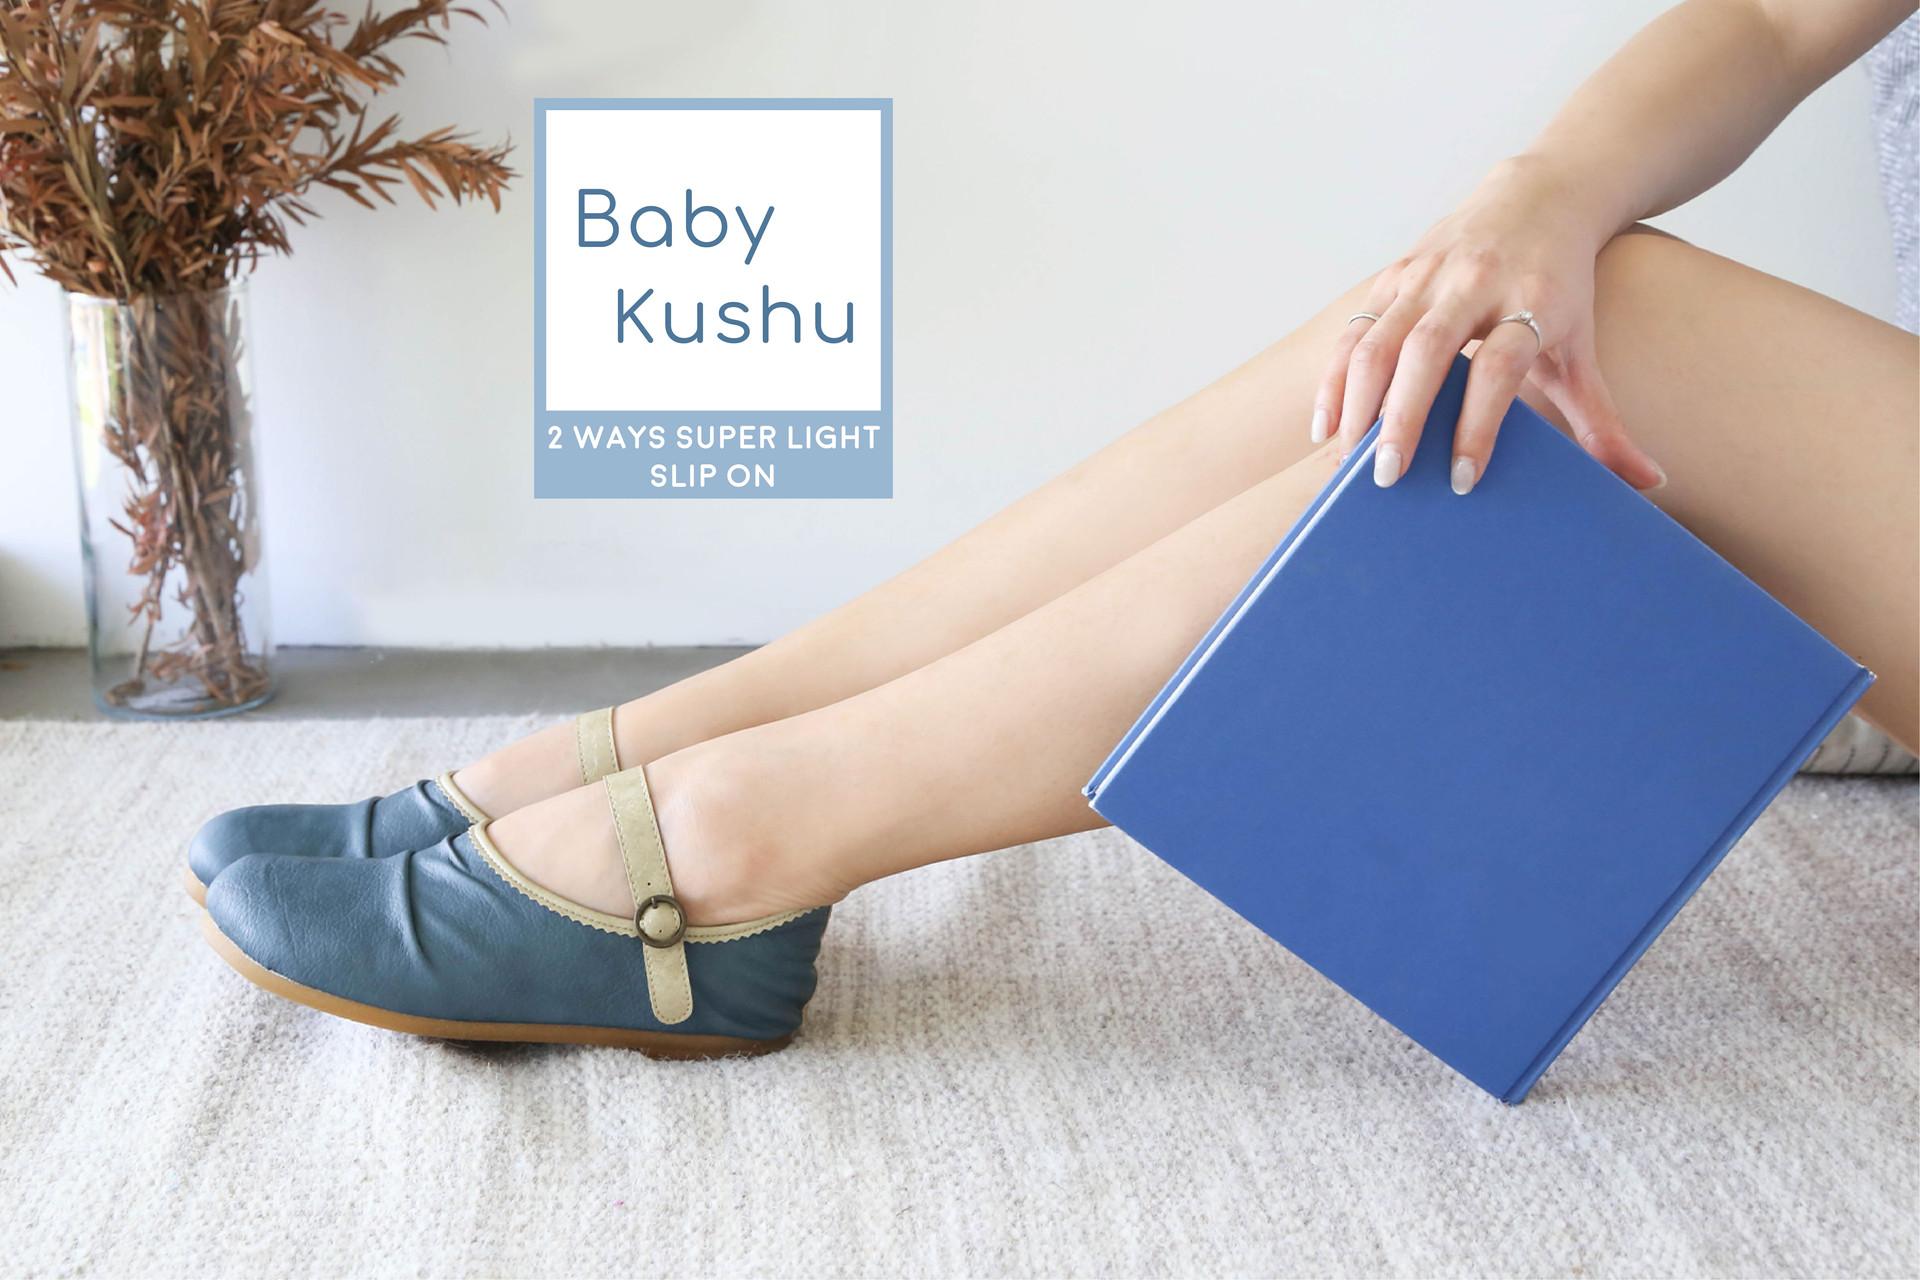 Baby Kushu, 2 ways Super Light Slip-on